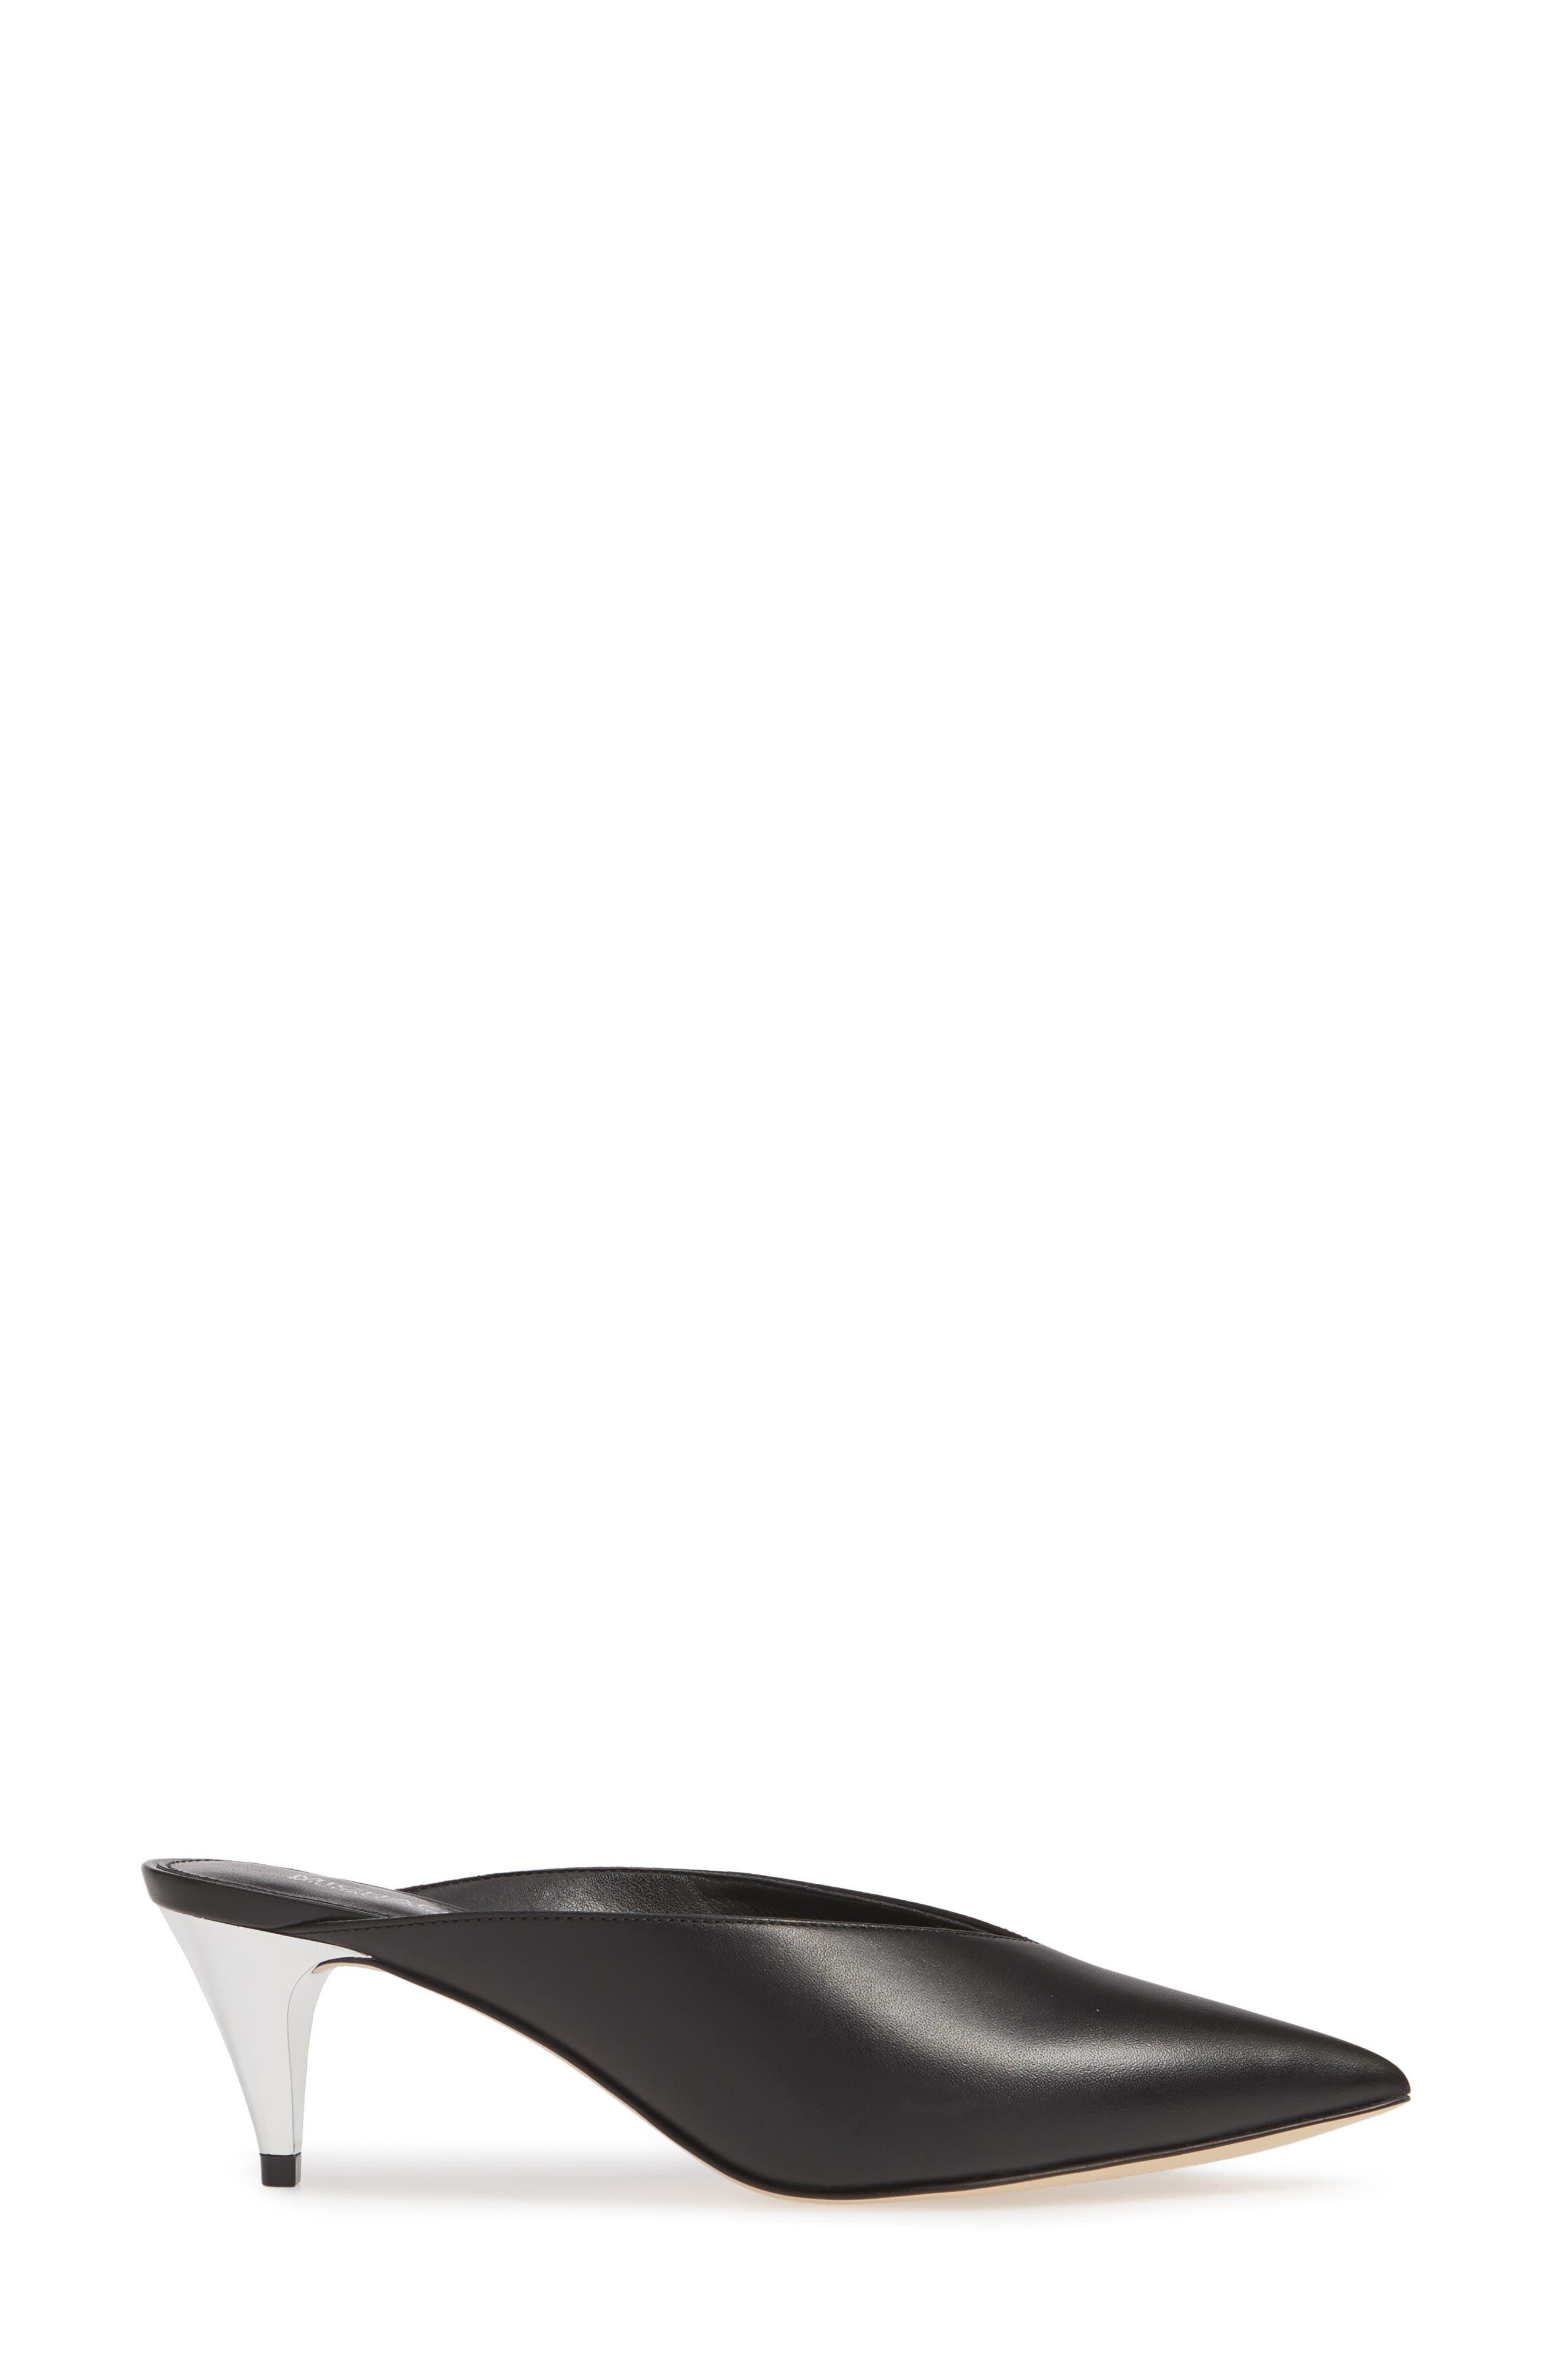 MICHAEL MICHAEL KORS, Cambria Mule, Alternate thumbnail 3, color, BLACK VACHETTA LEATHER